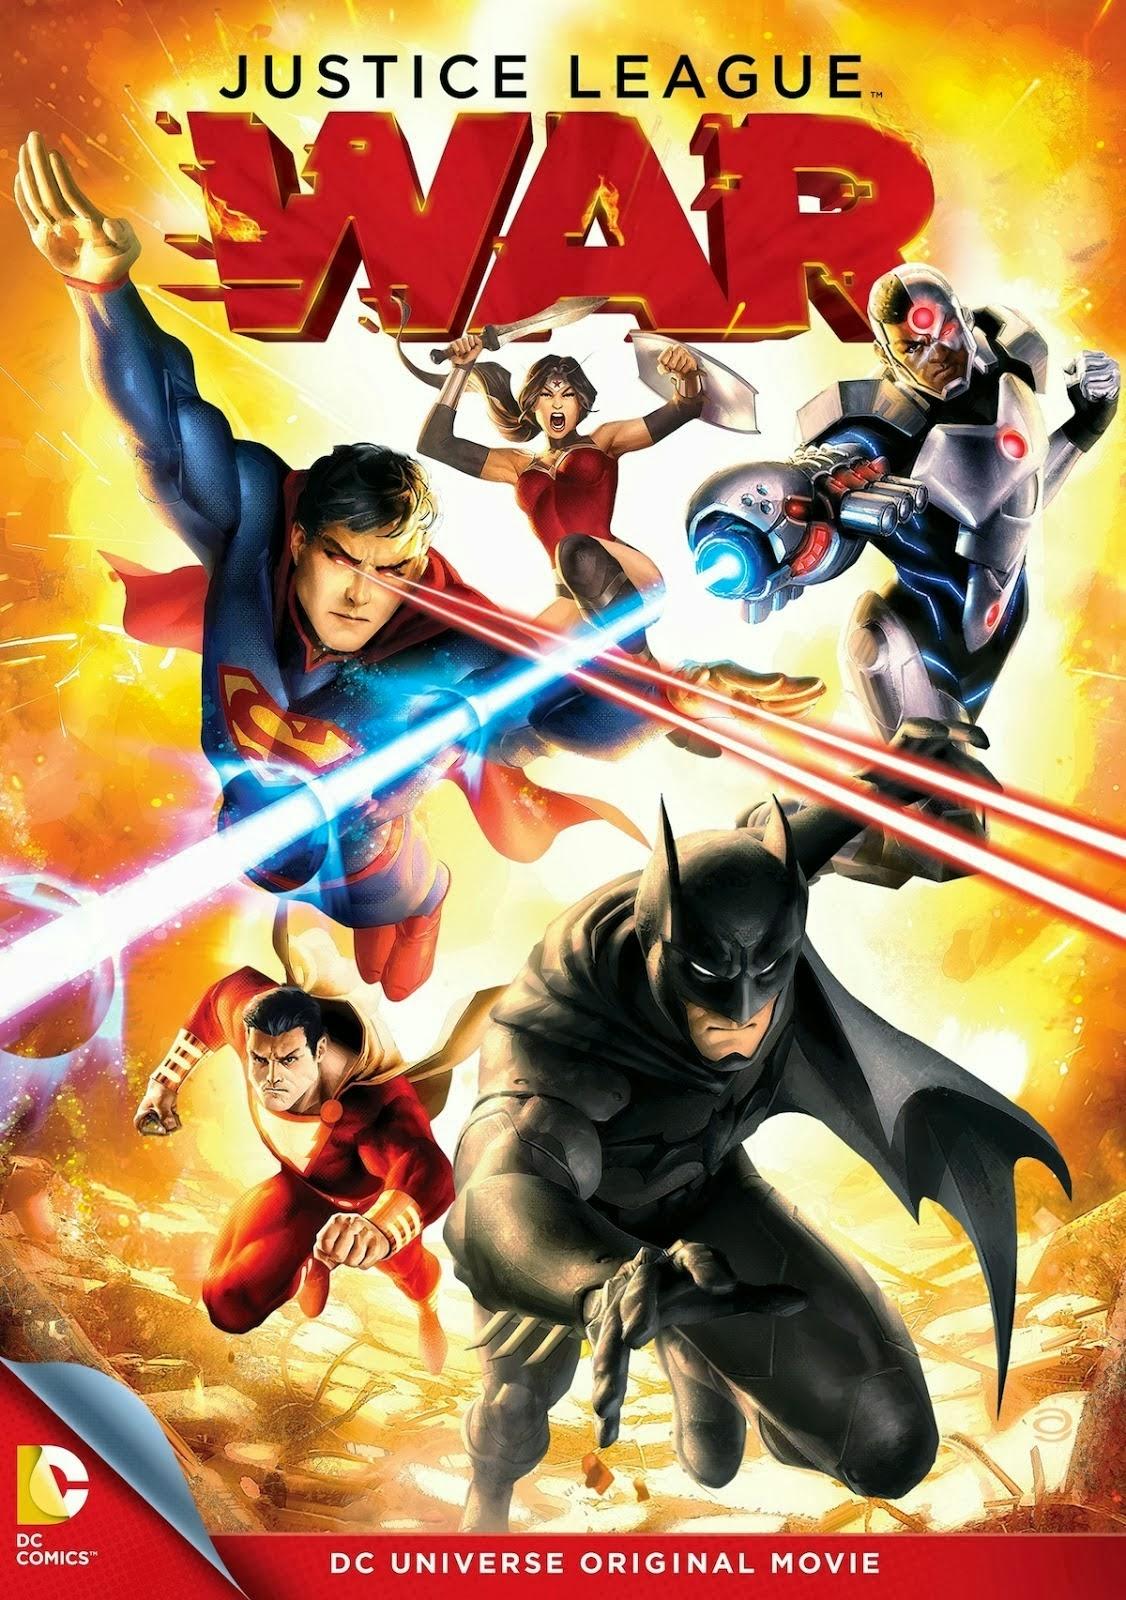 http://superheroesrevelados.blogspot.com.ar/2014/01/justice-league-war.html